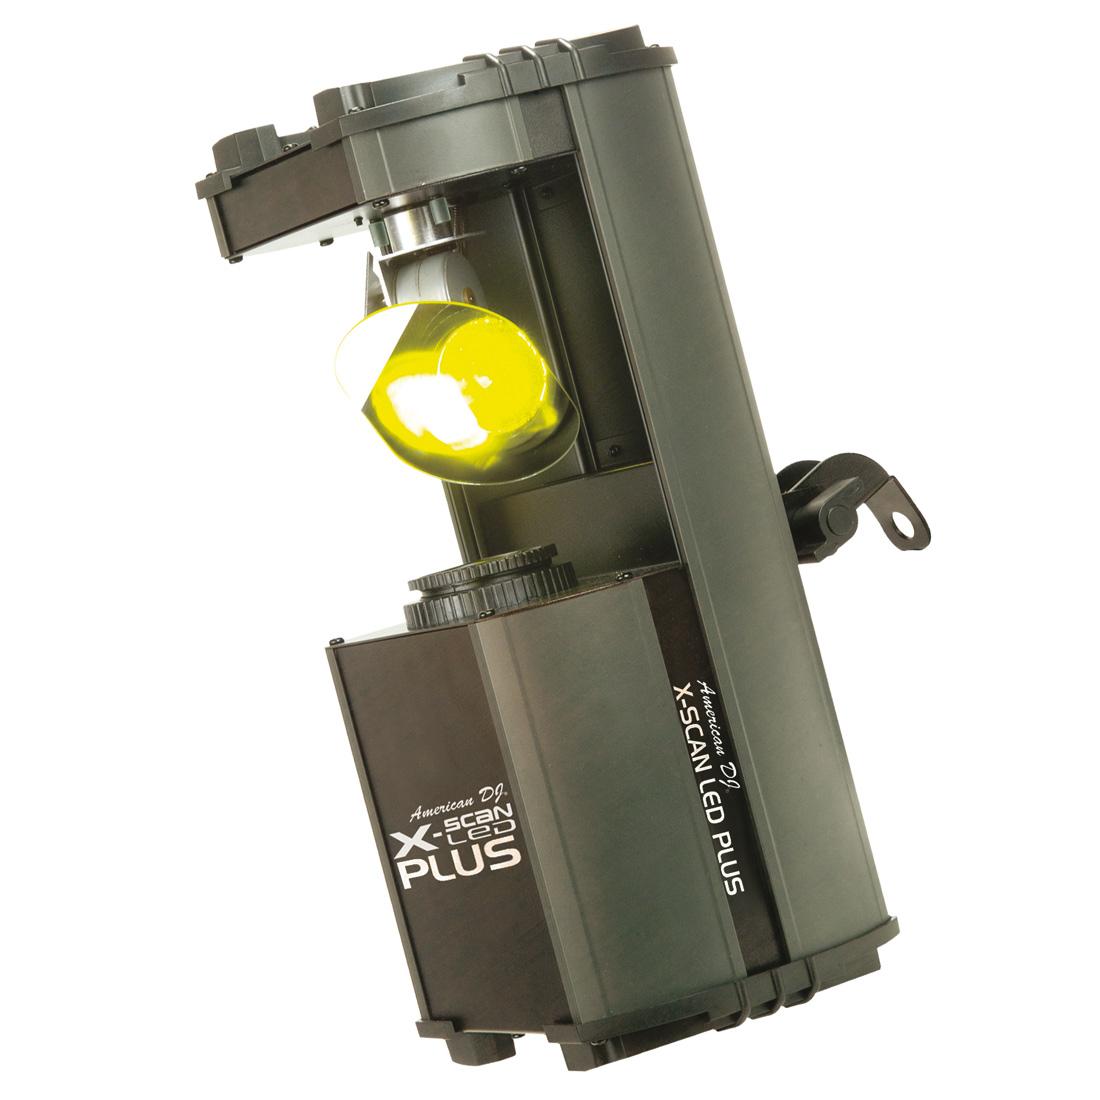 X-Scan LED Plus